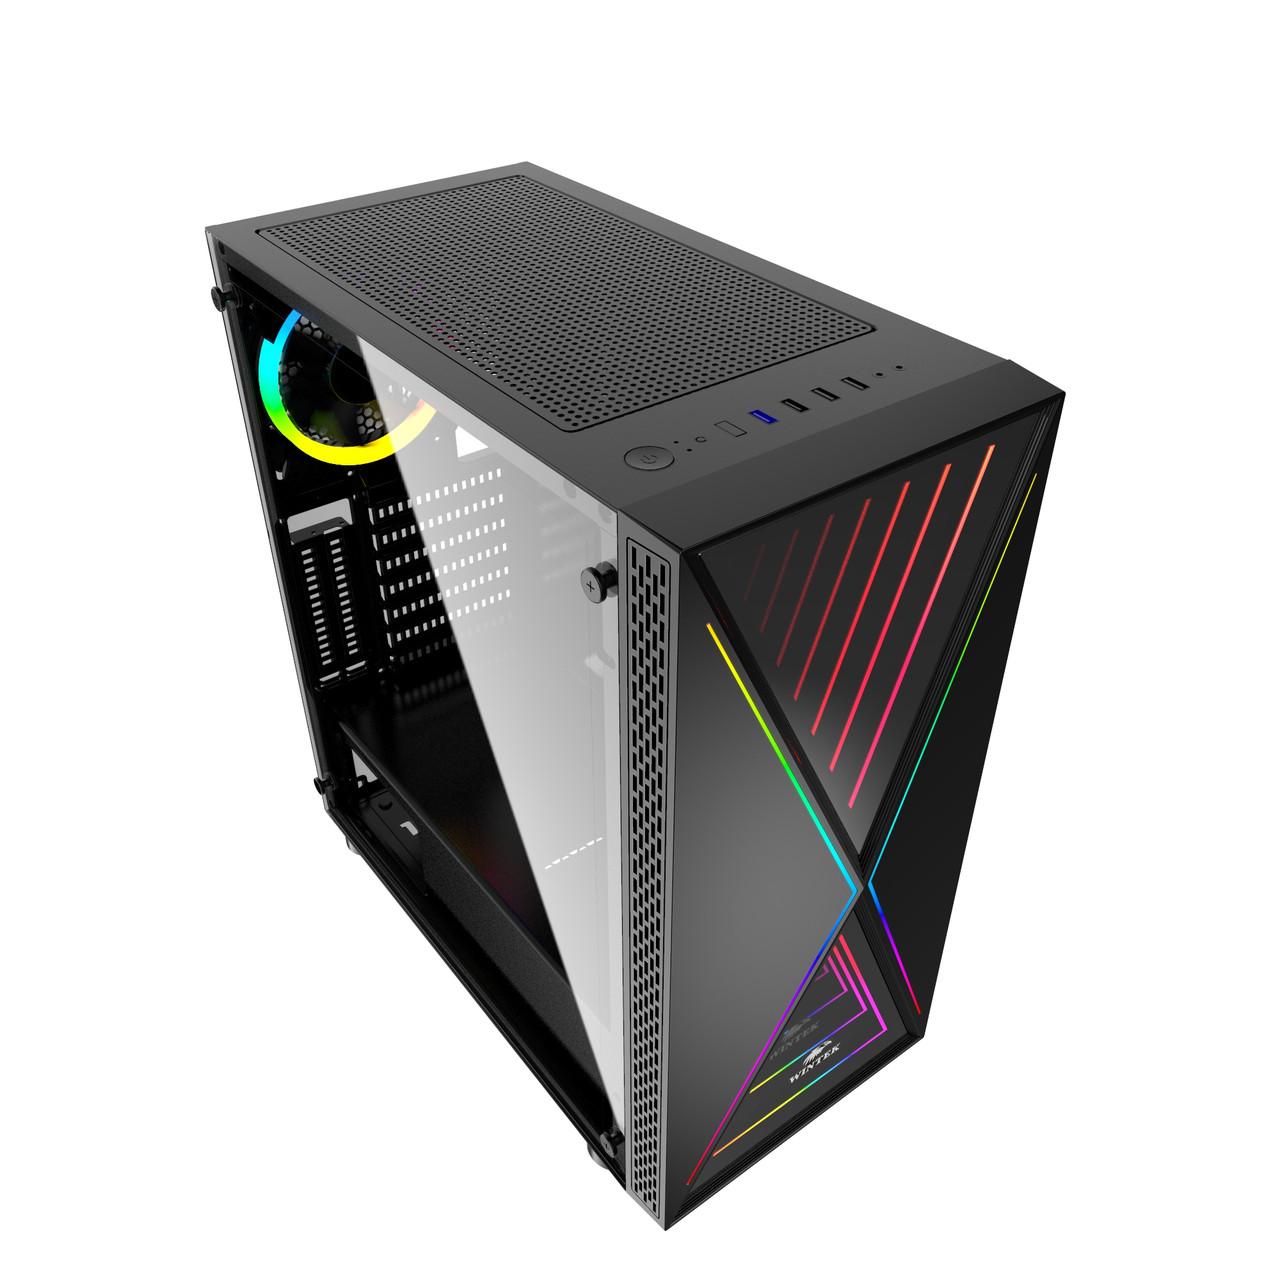 Корпус Wintek XGame T-5618 TG, ITX/ATX, USB 1*3.0/2*2.0, HD-Audio+Mic, 0,5mm, 1*ARGB fan+contr